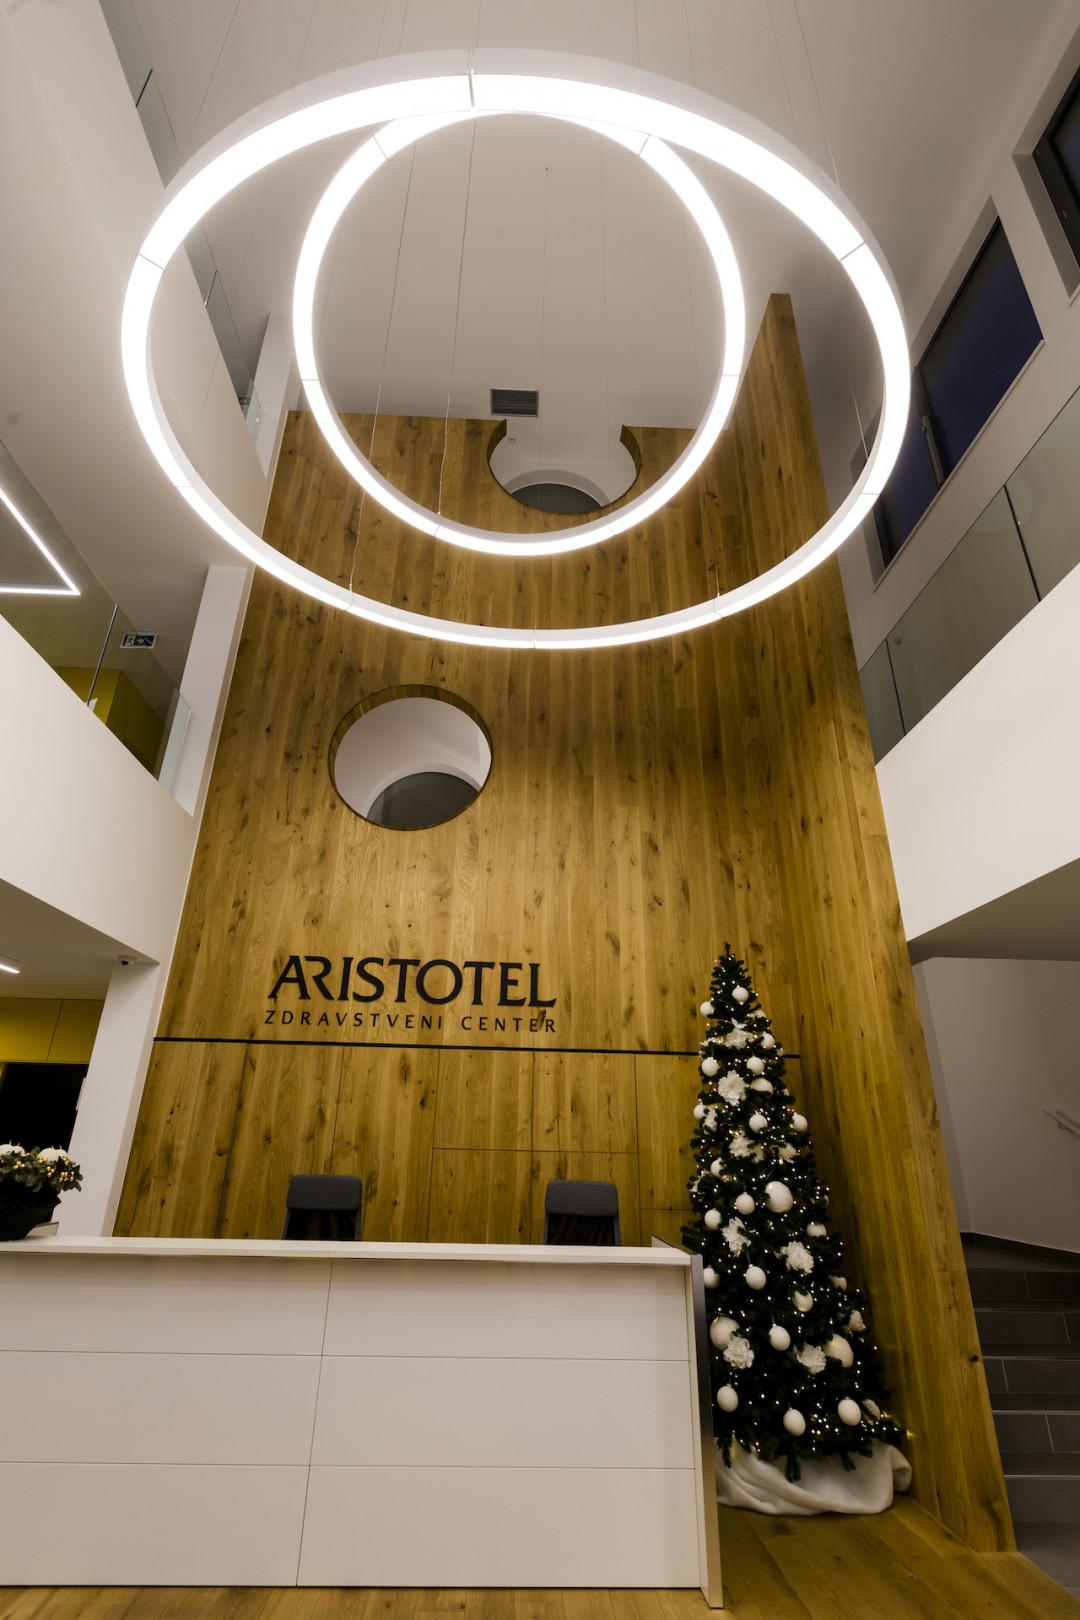 Aristotel, zdravstveni center